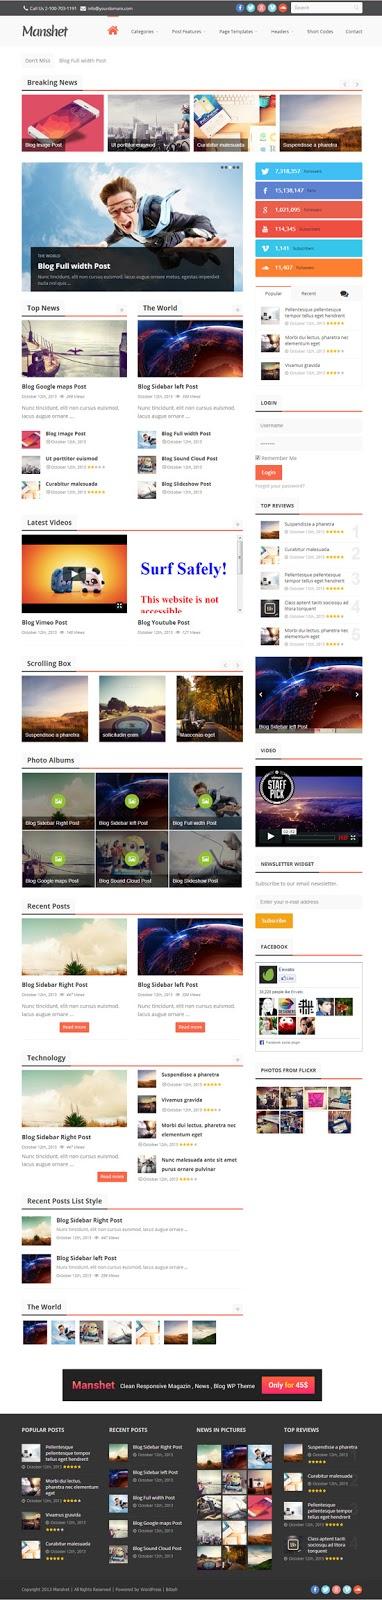 Manshet – Retina Responsive WordPress News, Magazine Theme